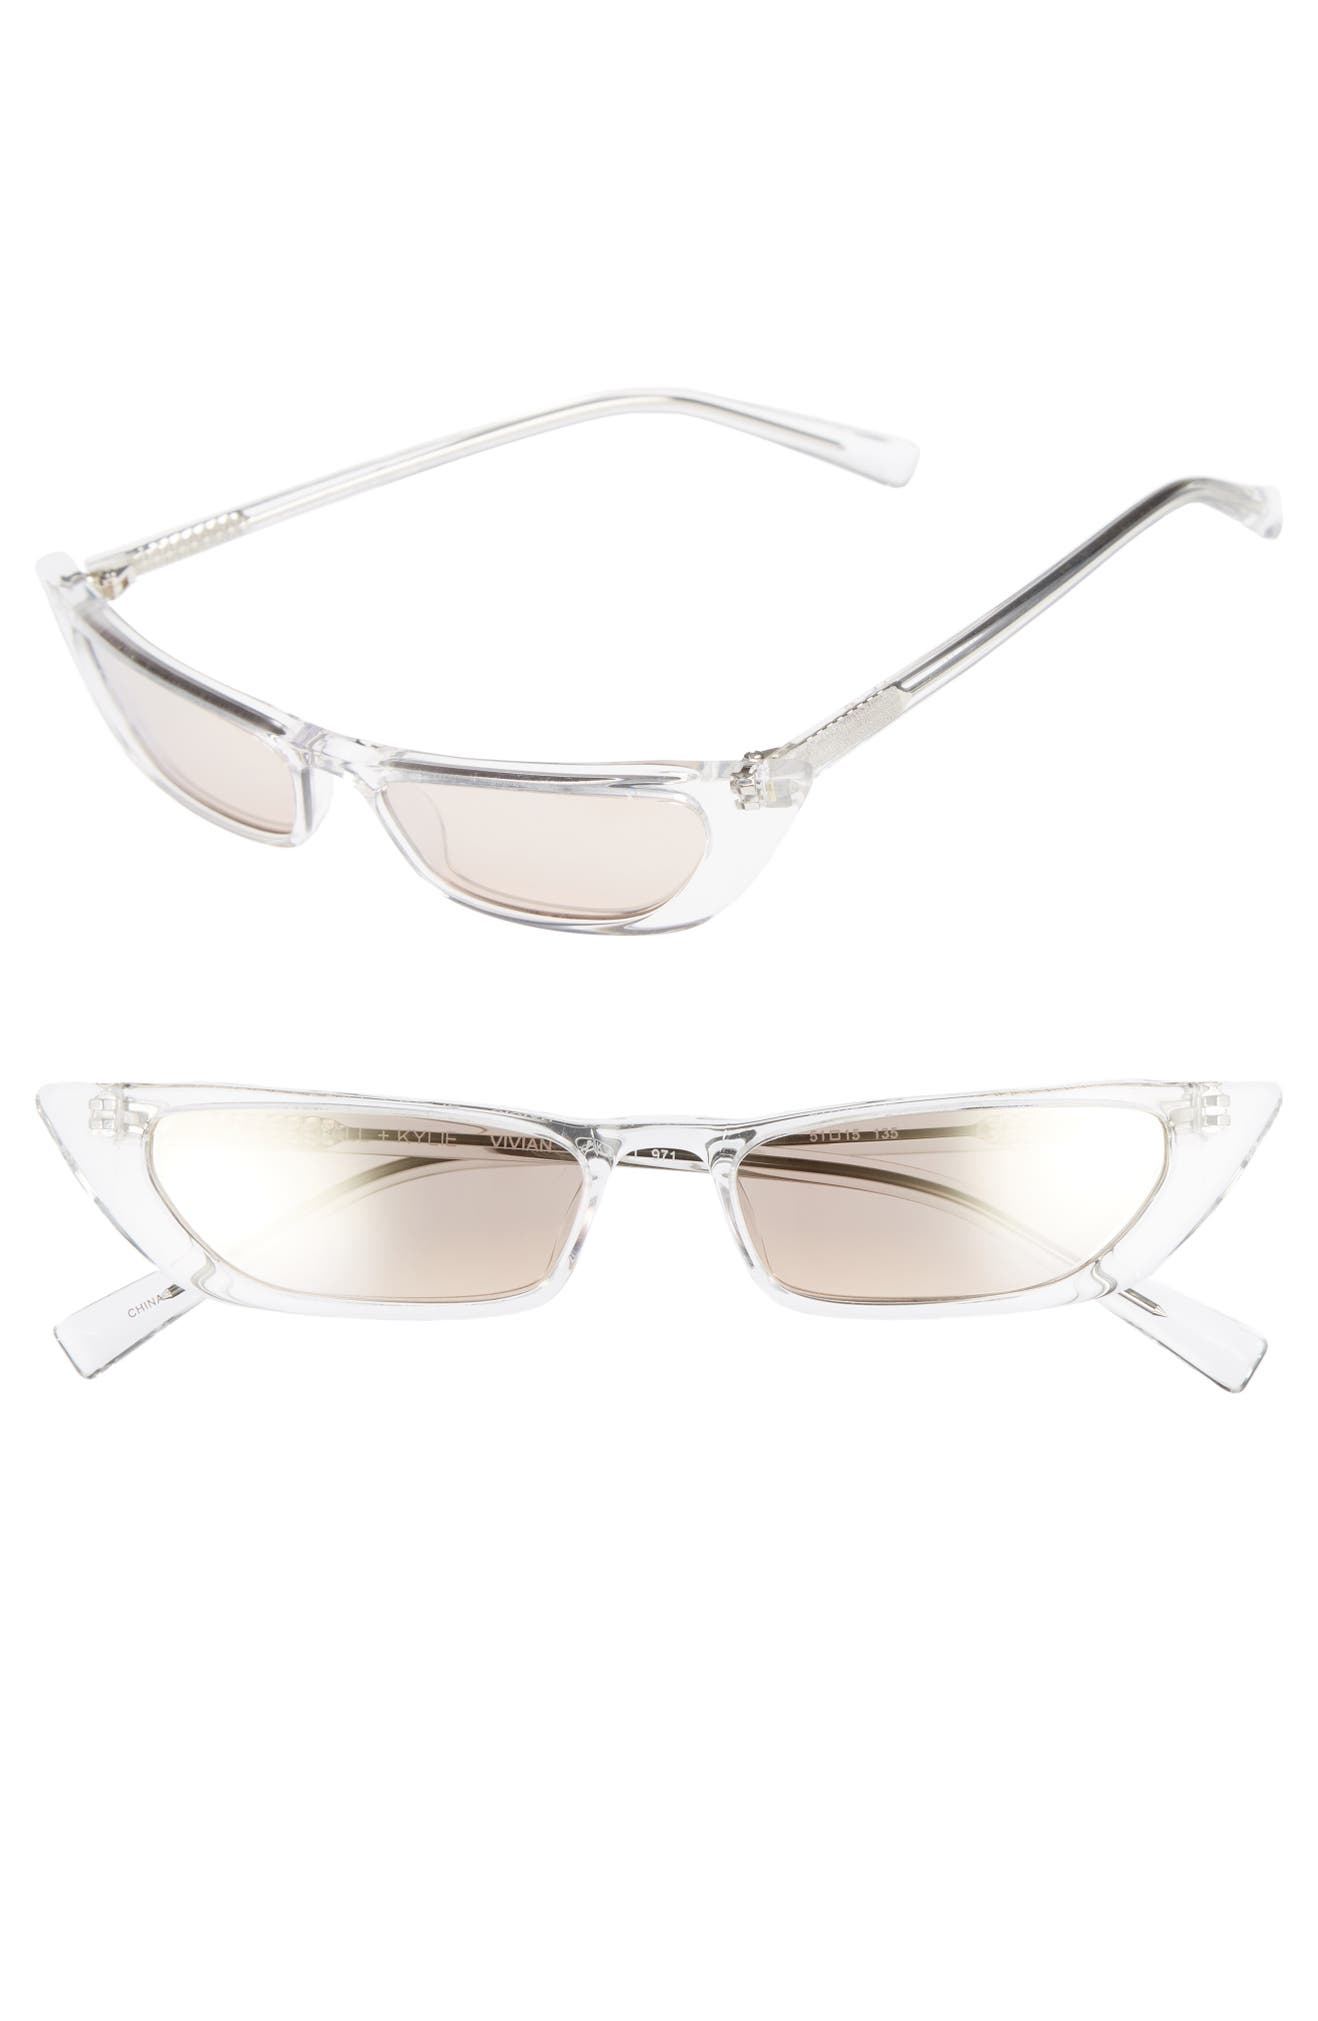 7142f96b8b2 KENDALL + KYLIE Vivian Extreme 51mm Cat Eye Sunglasses